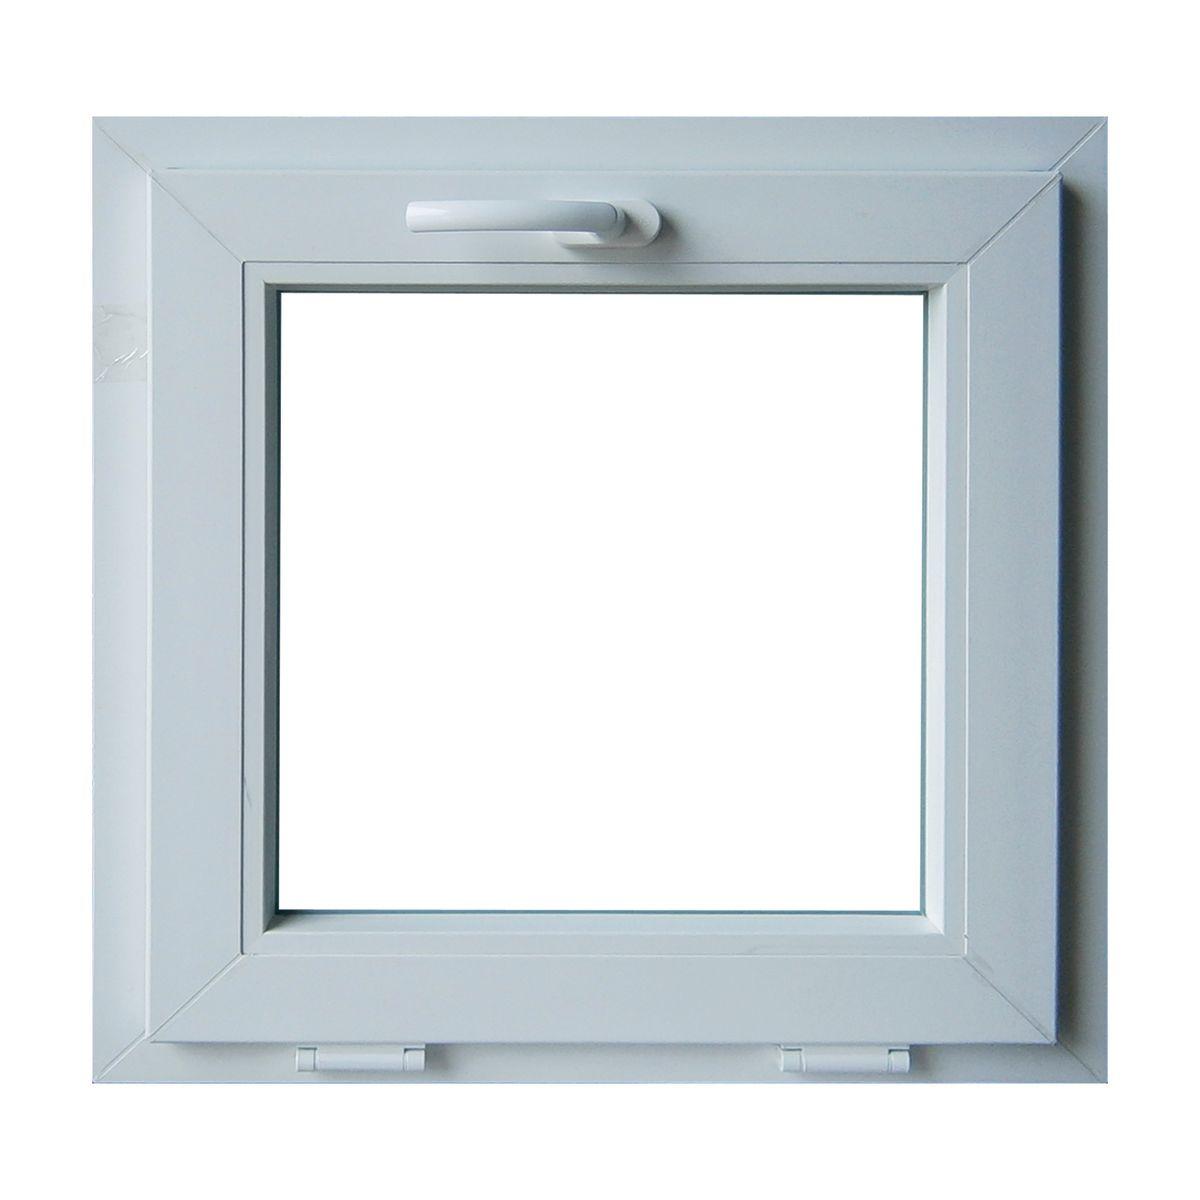 Misure finestre standard best fabulous finestre e porte - Costo finestre doppi vetri ...